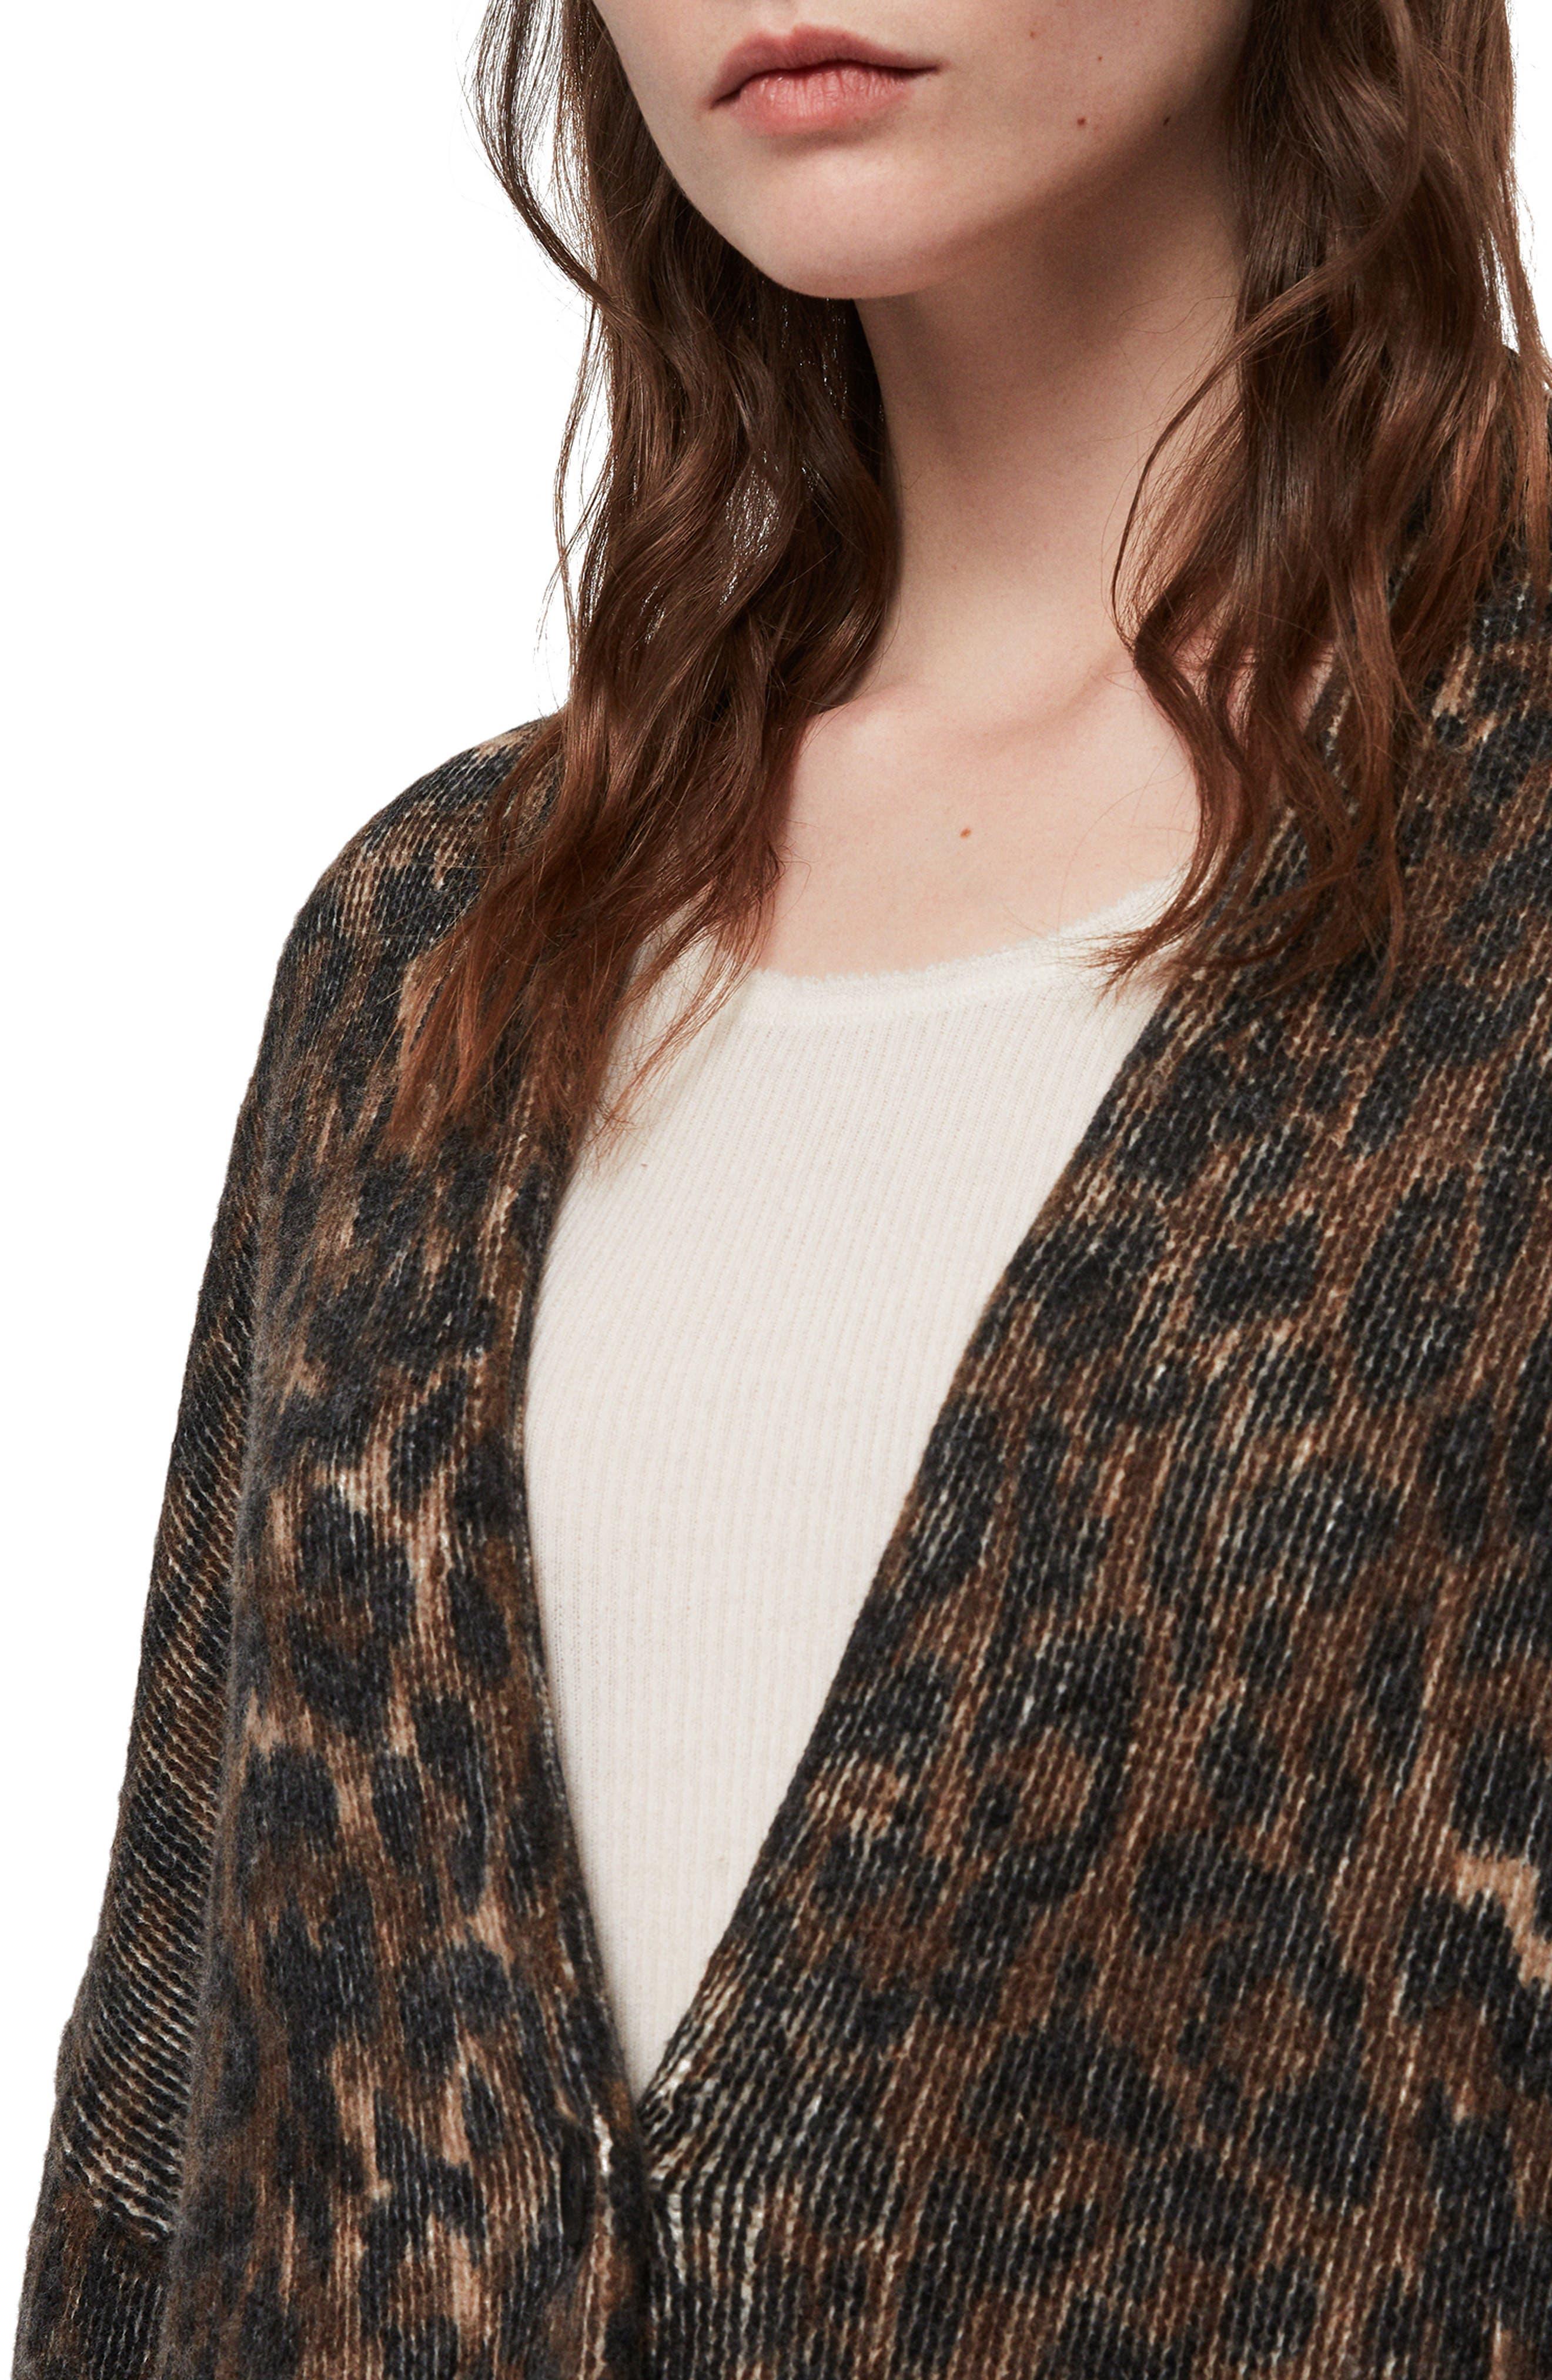 Ph Leopard Wool Blend Cardigan,                             Alternate thumbnail 3, color,                             LEOPARD BROWN